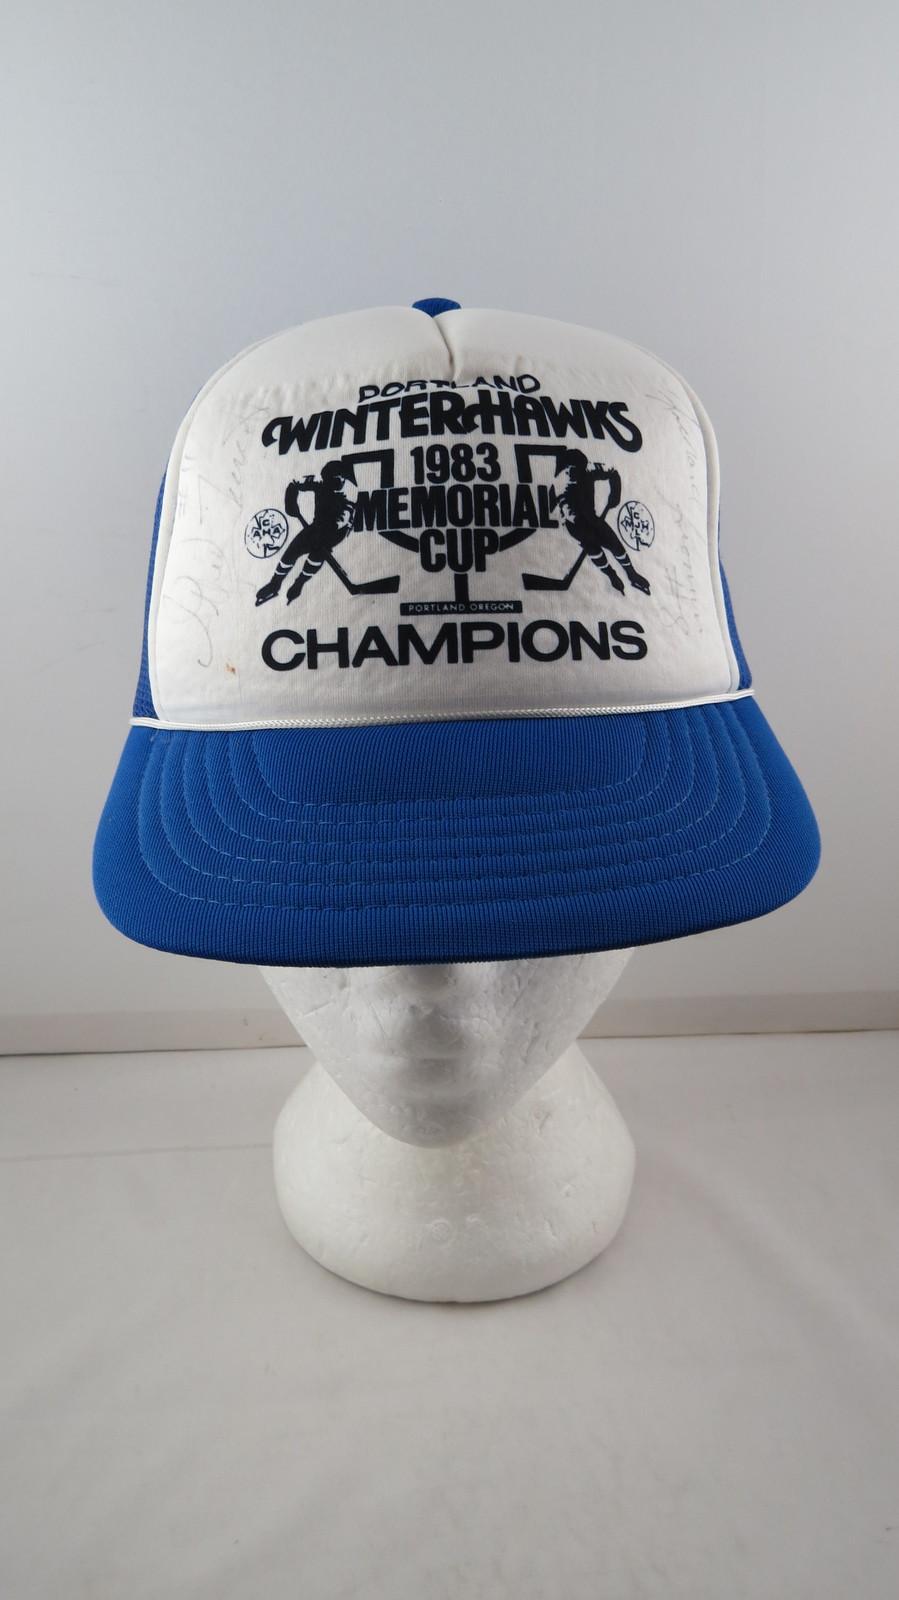 d079e88a5ce17 Portland Winterhawks Hat (VTG) - 1983 and 50 similar items